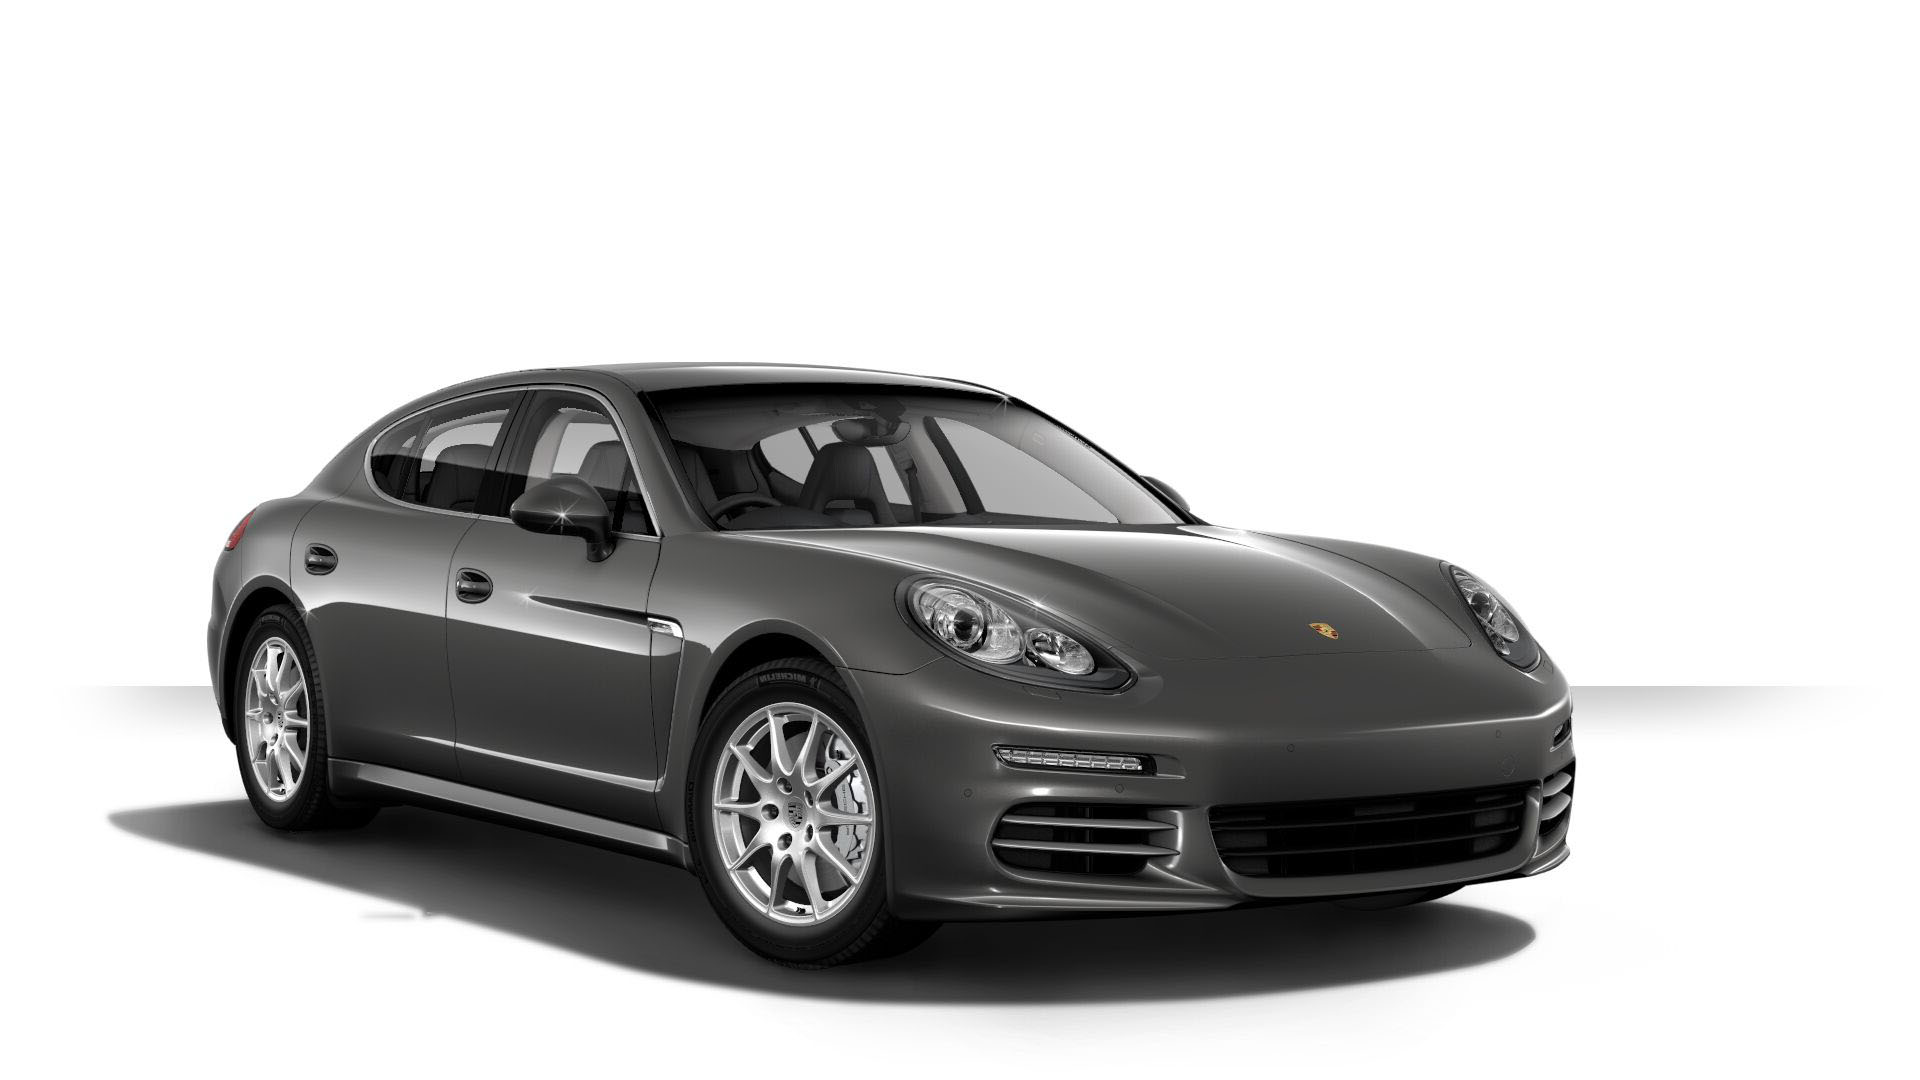 2016 Porsche Panamera Front View